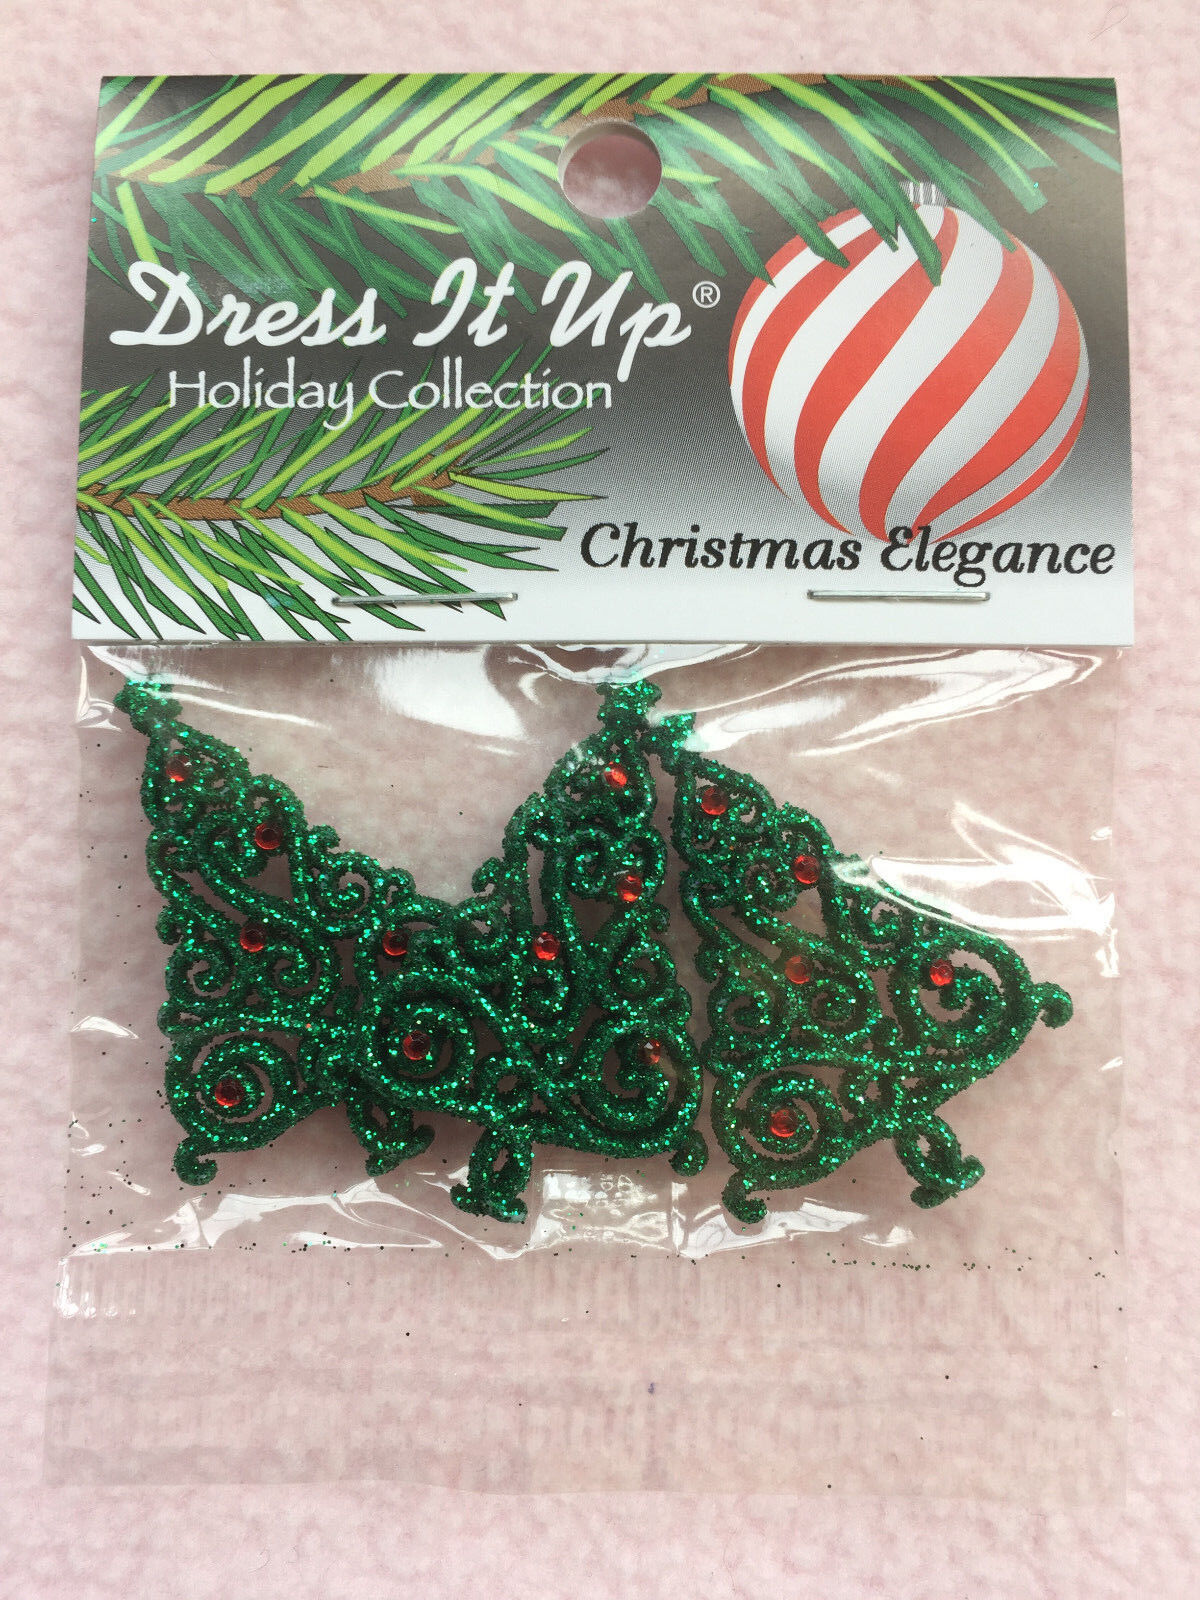 DRESS IT UP Embellishments Christmas Elegance 9074 Flatbacked Trees